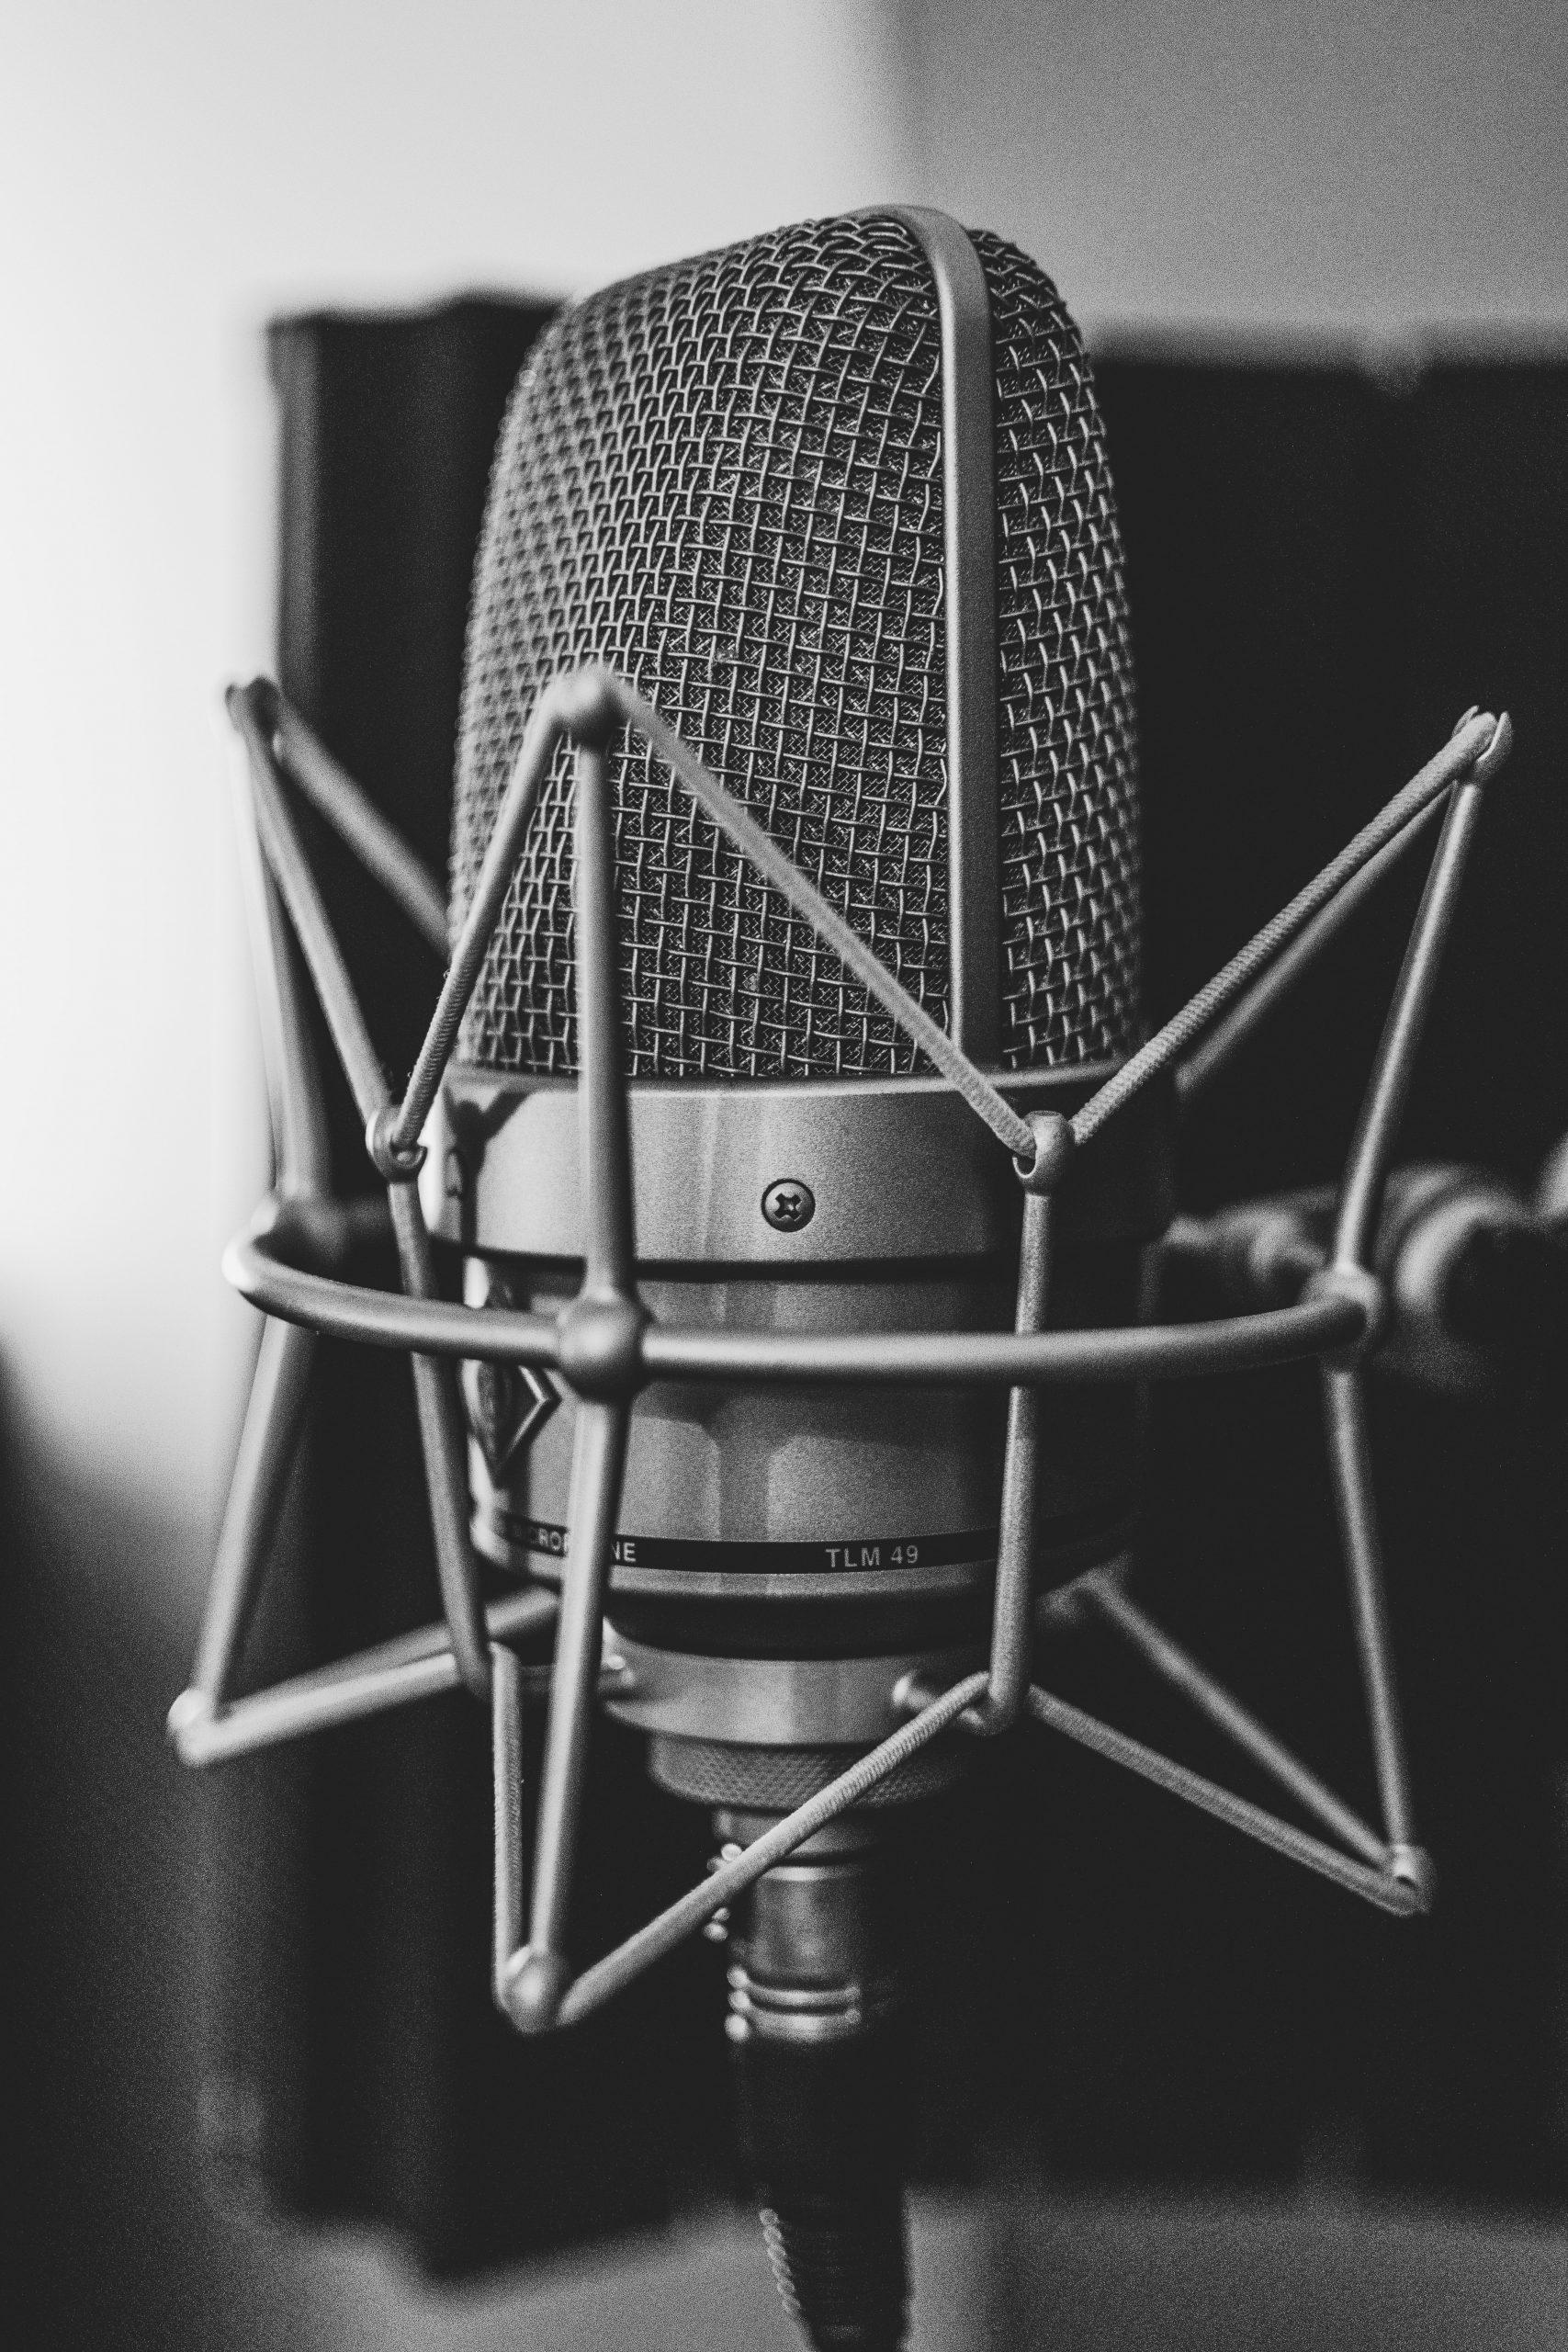 Microfone Aberto é a Essência dos Encontros de Rap na PUC